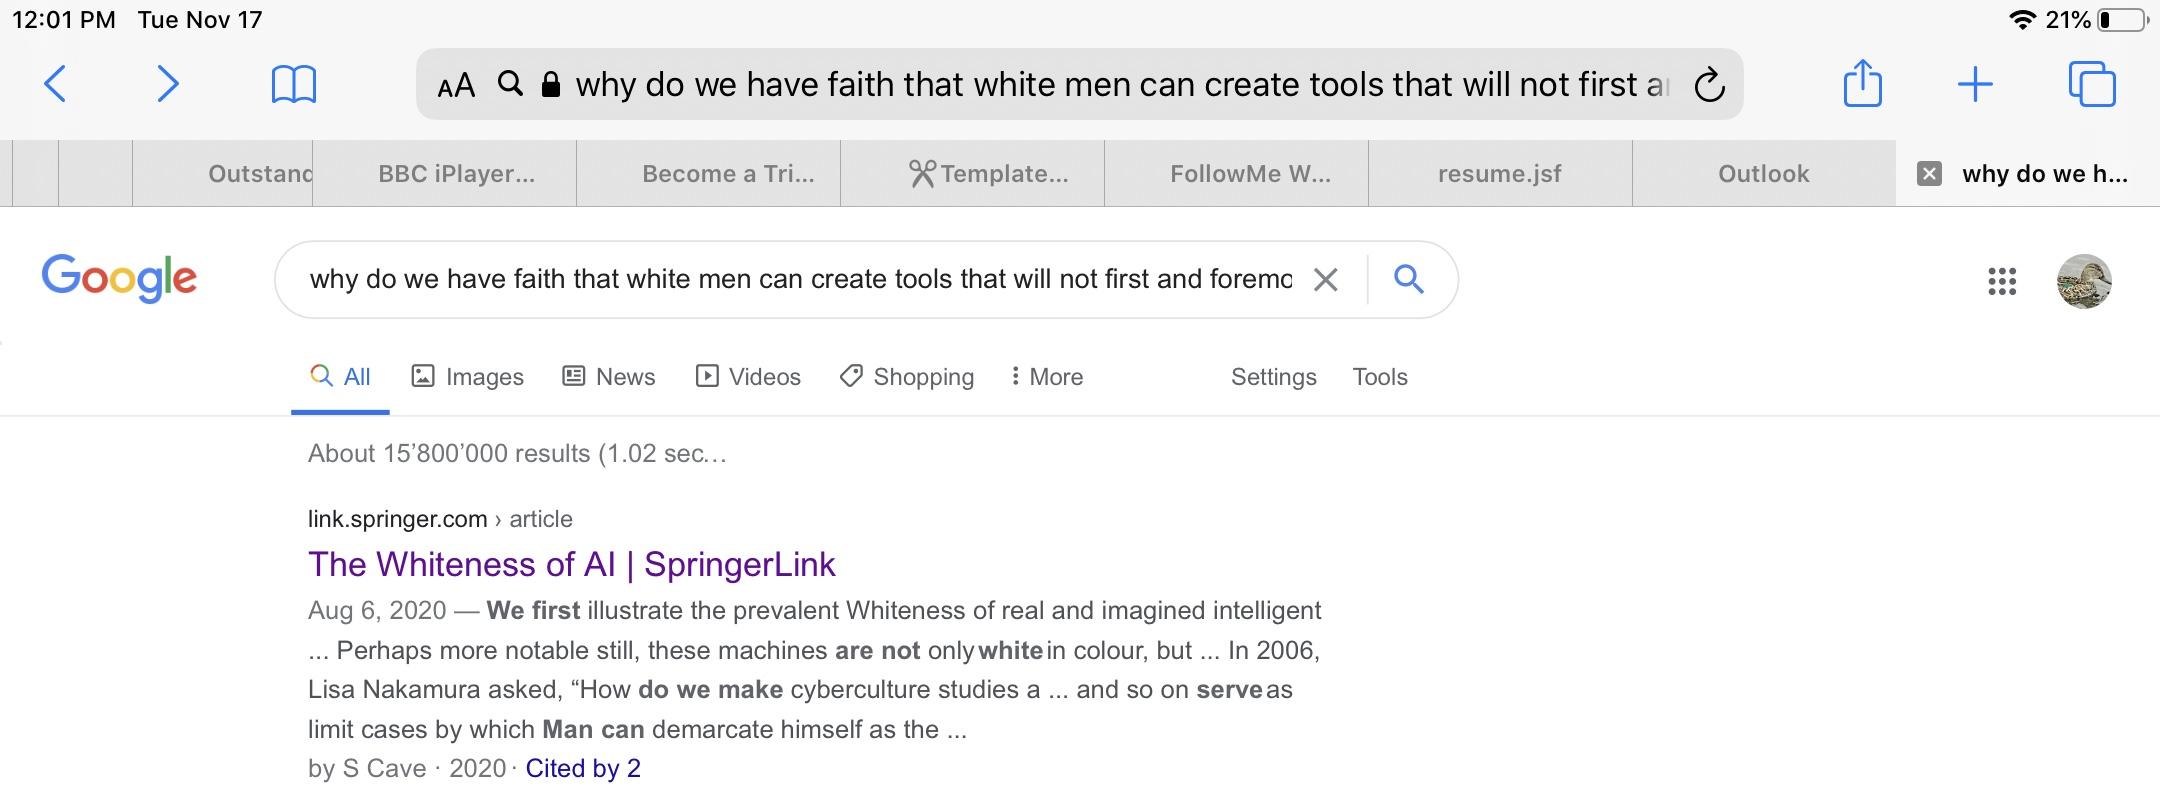 Figure 1. Screenshot, Google search, November 17, 2020